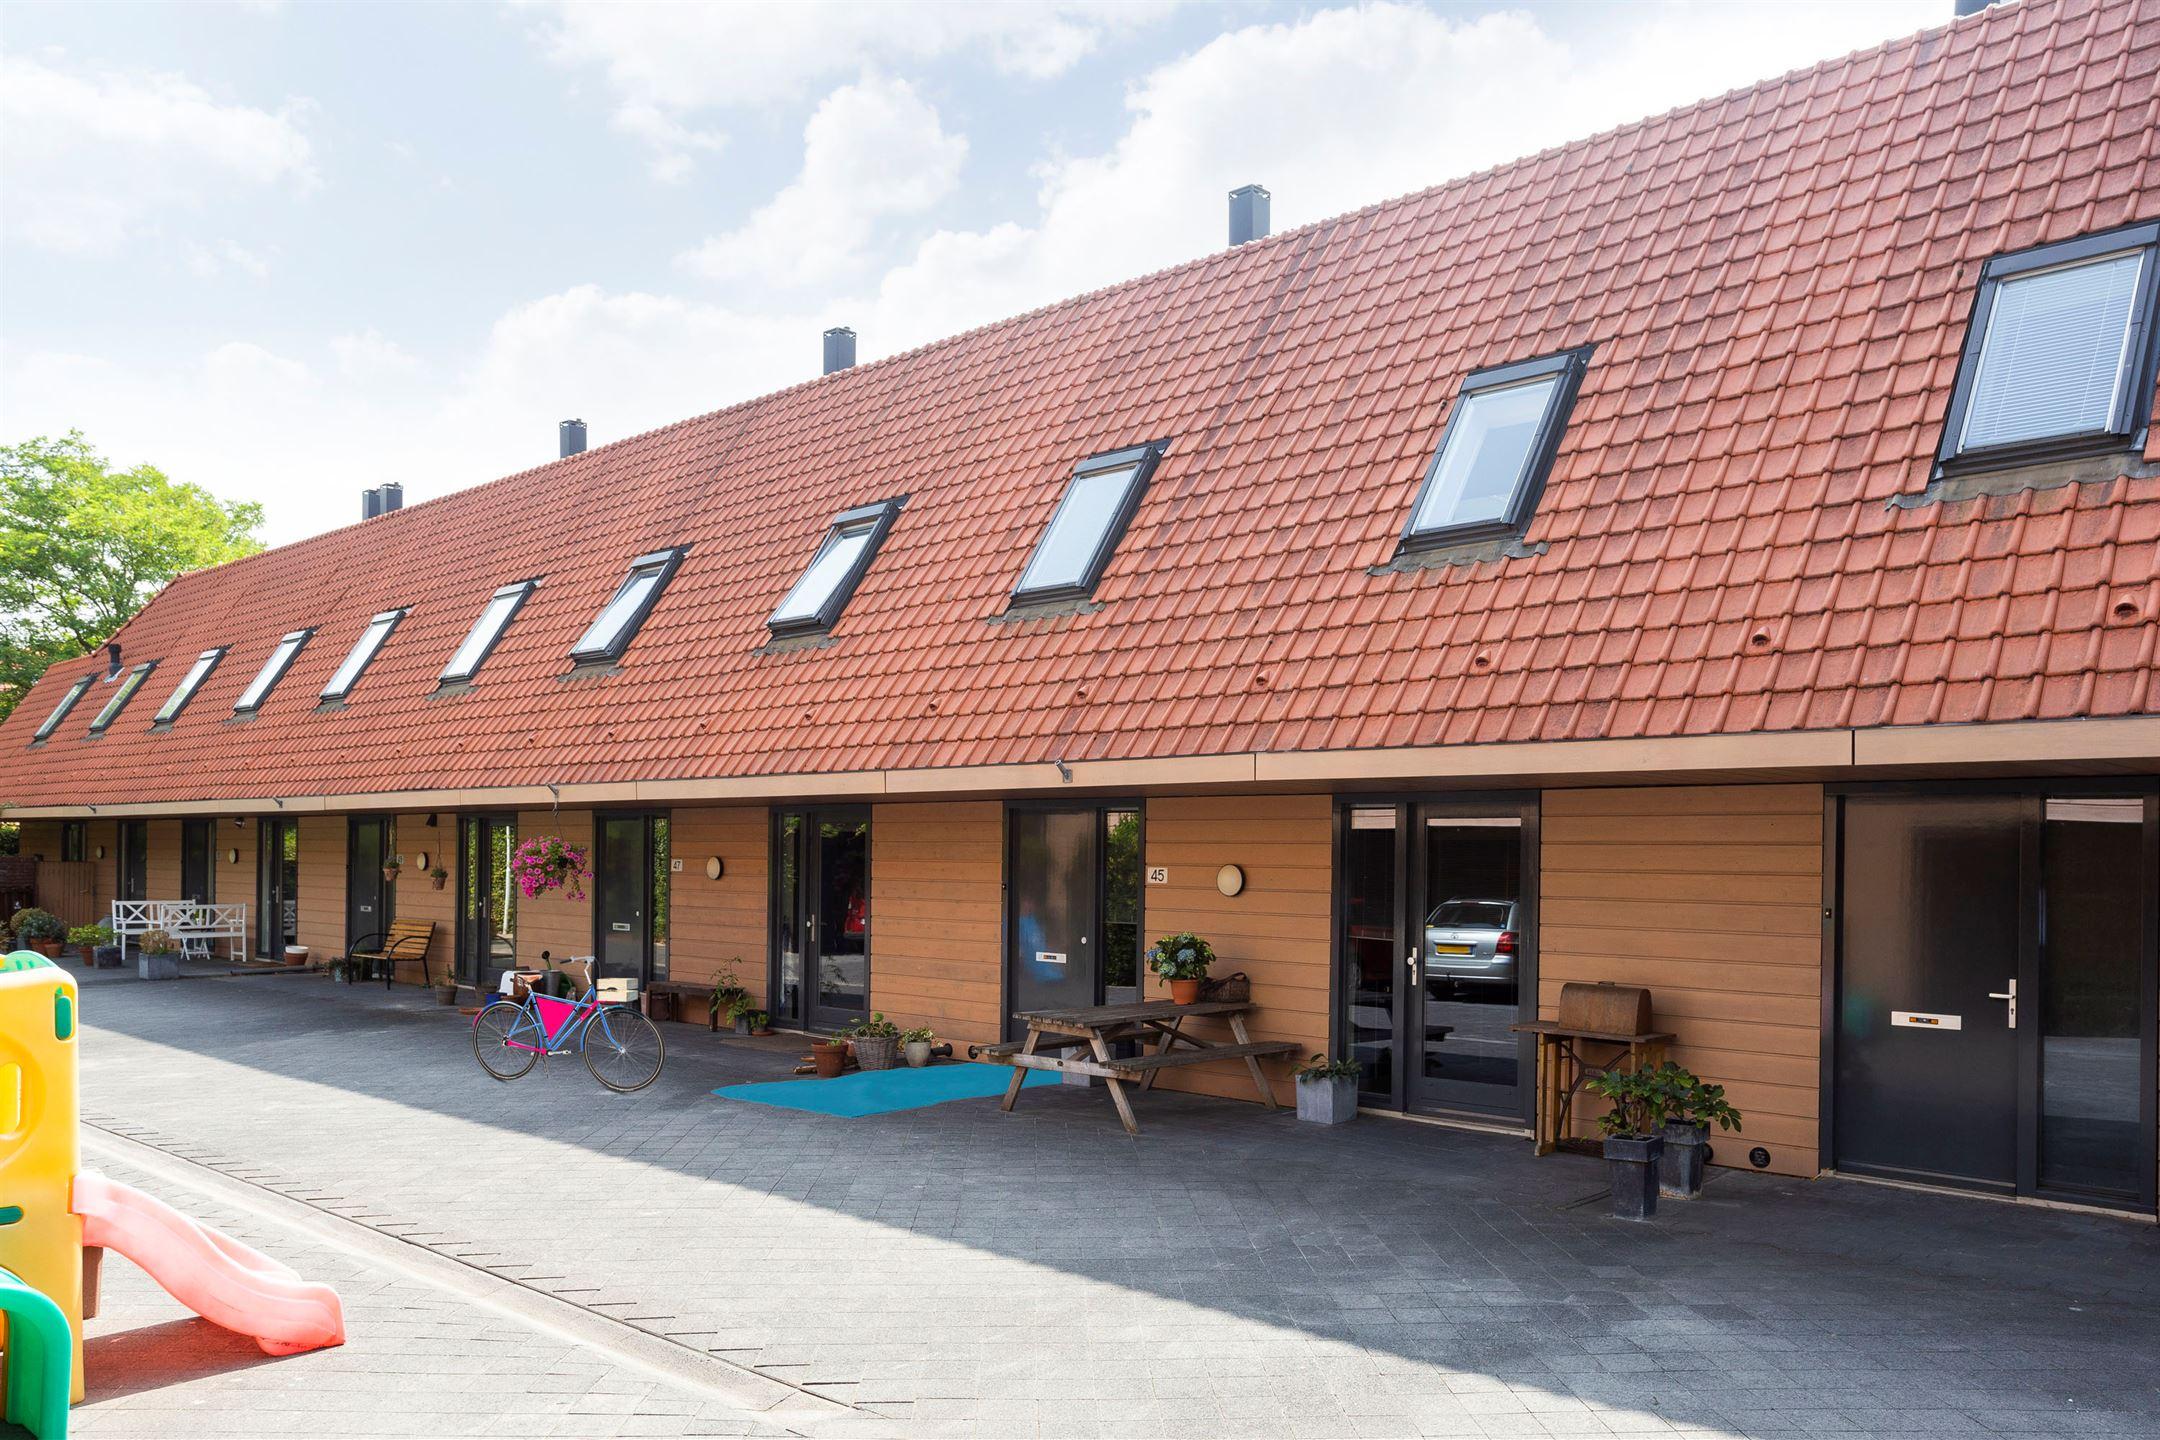 Complete Badkamer Utrecht : Verkocht klifrakplantsoen rg utrecht funda